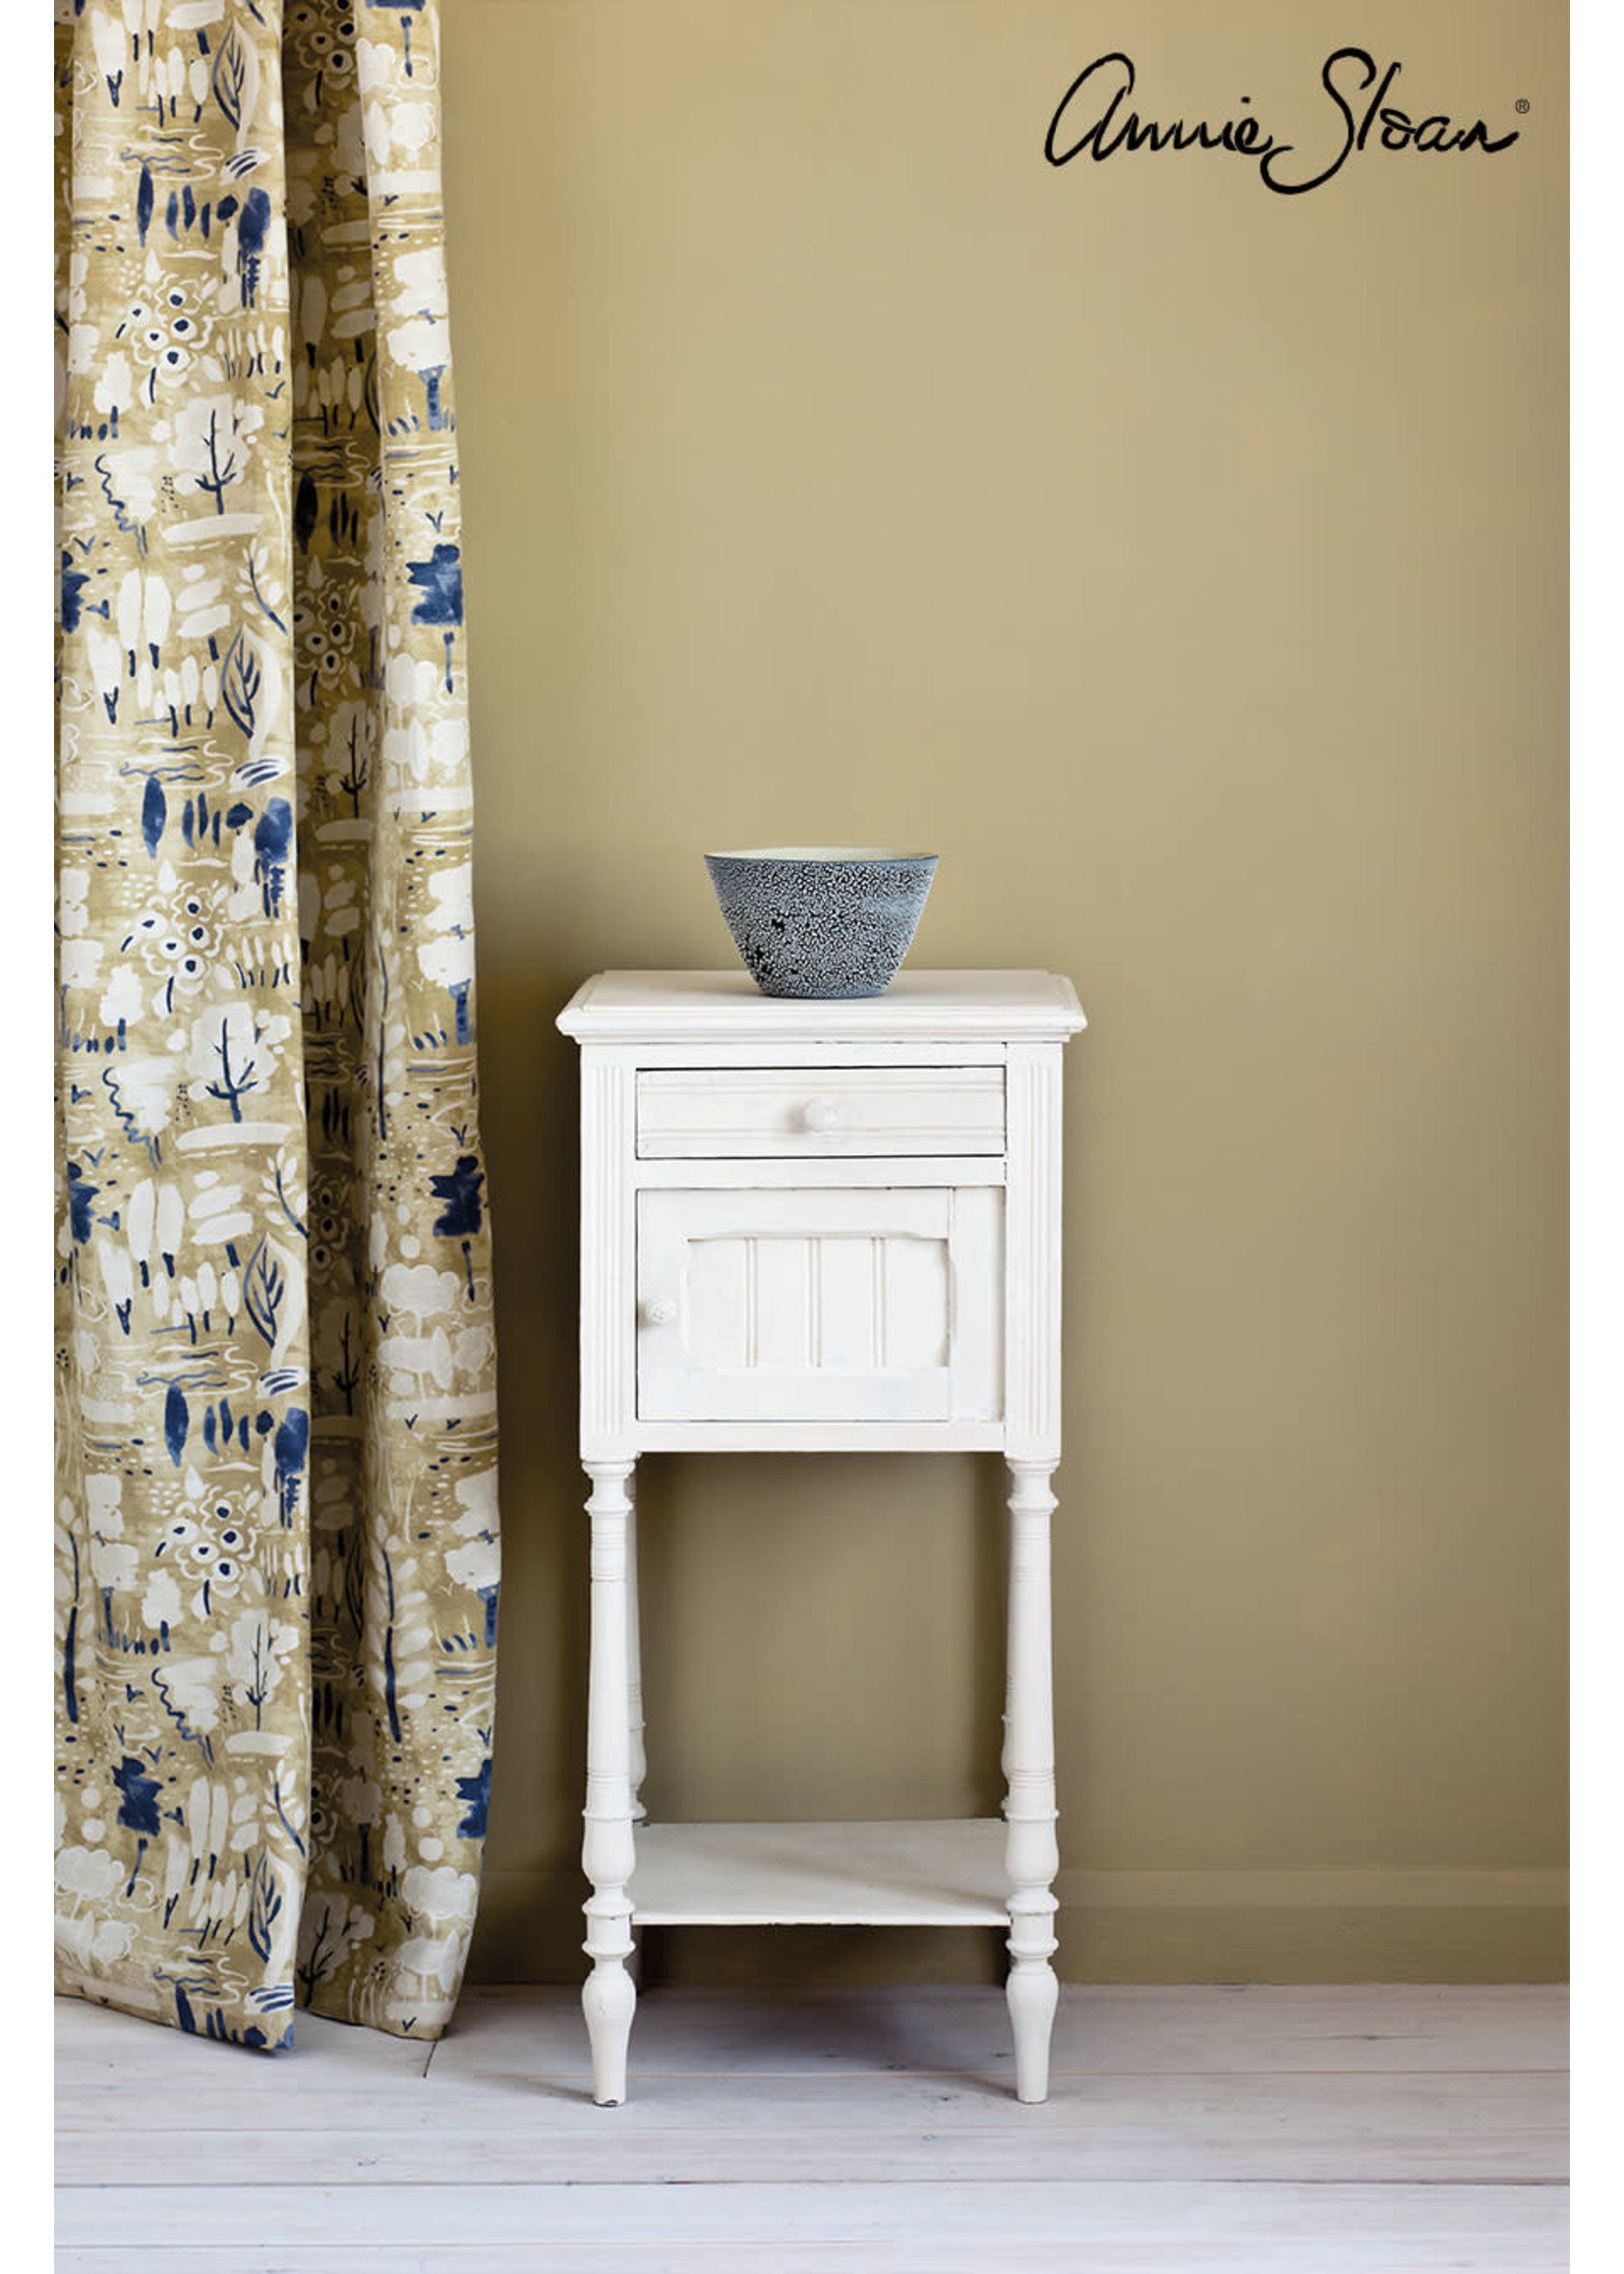 Annie Sloan Chalk Paint® Original Annie Sloan Chalk Paint ®